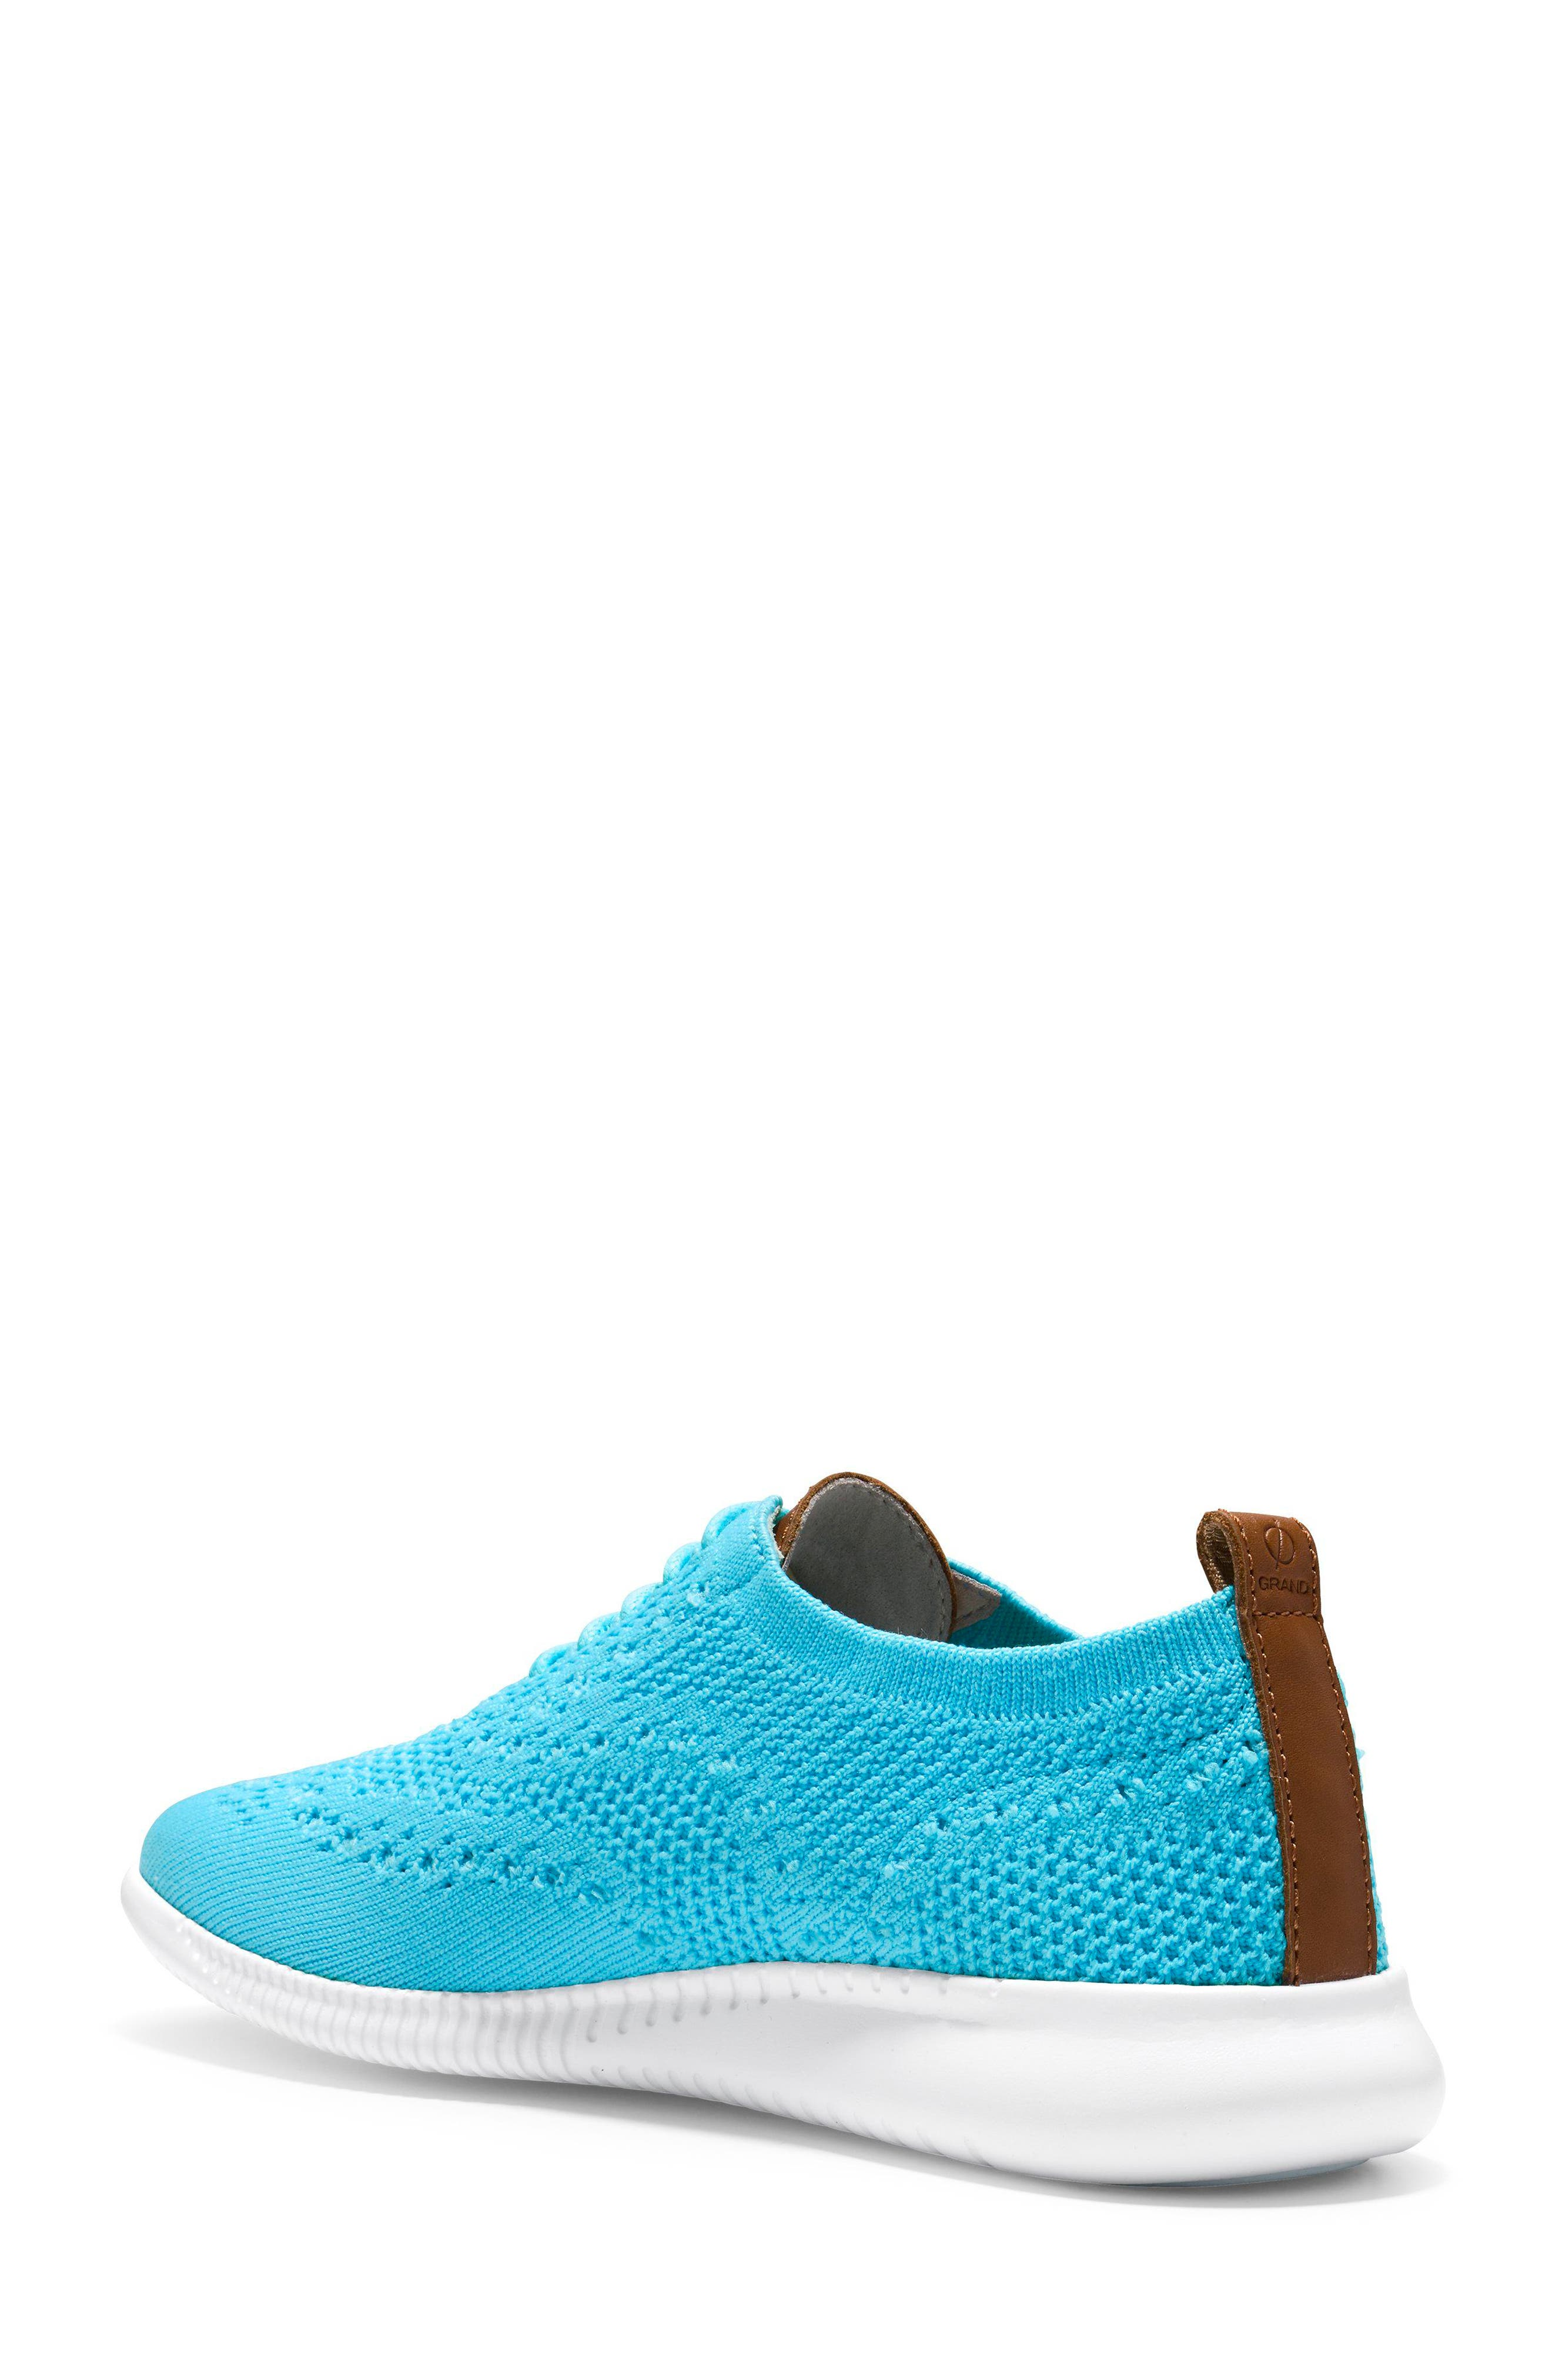 2.ZERØGRAND Stitchlite Wingtip Sneaker,                             Alternate thumbnail 2, color,                             Bluefish Fabric